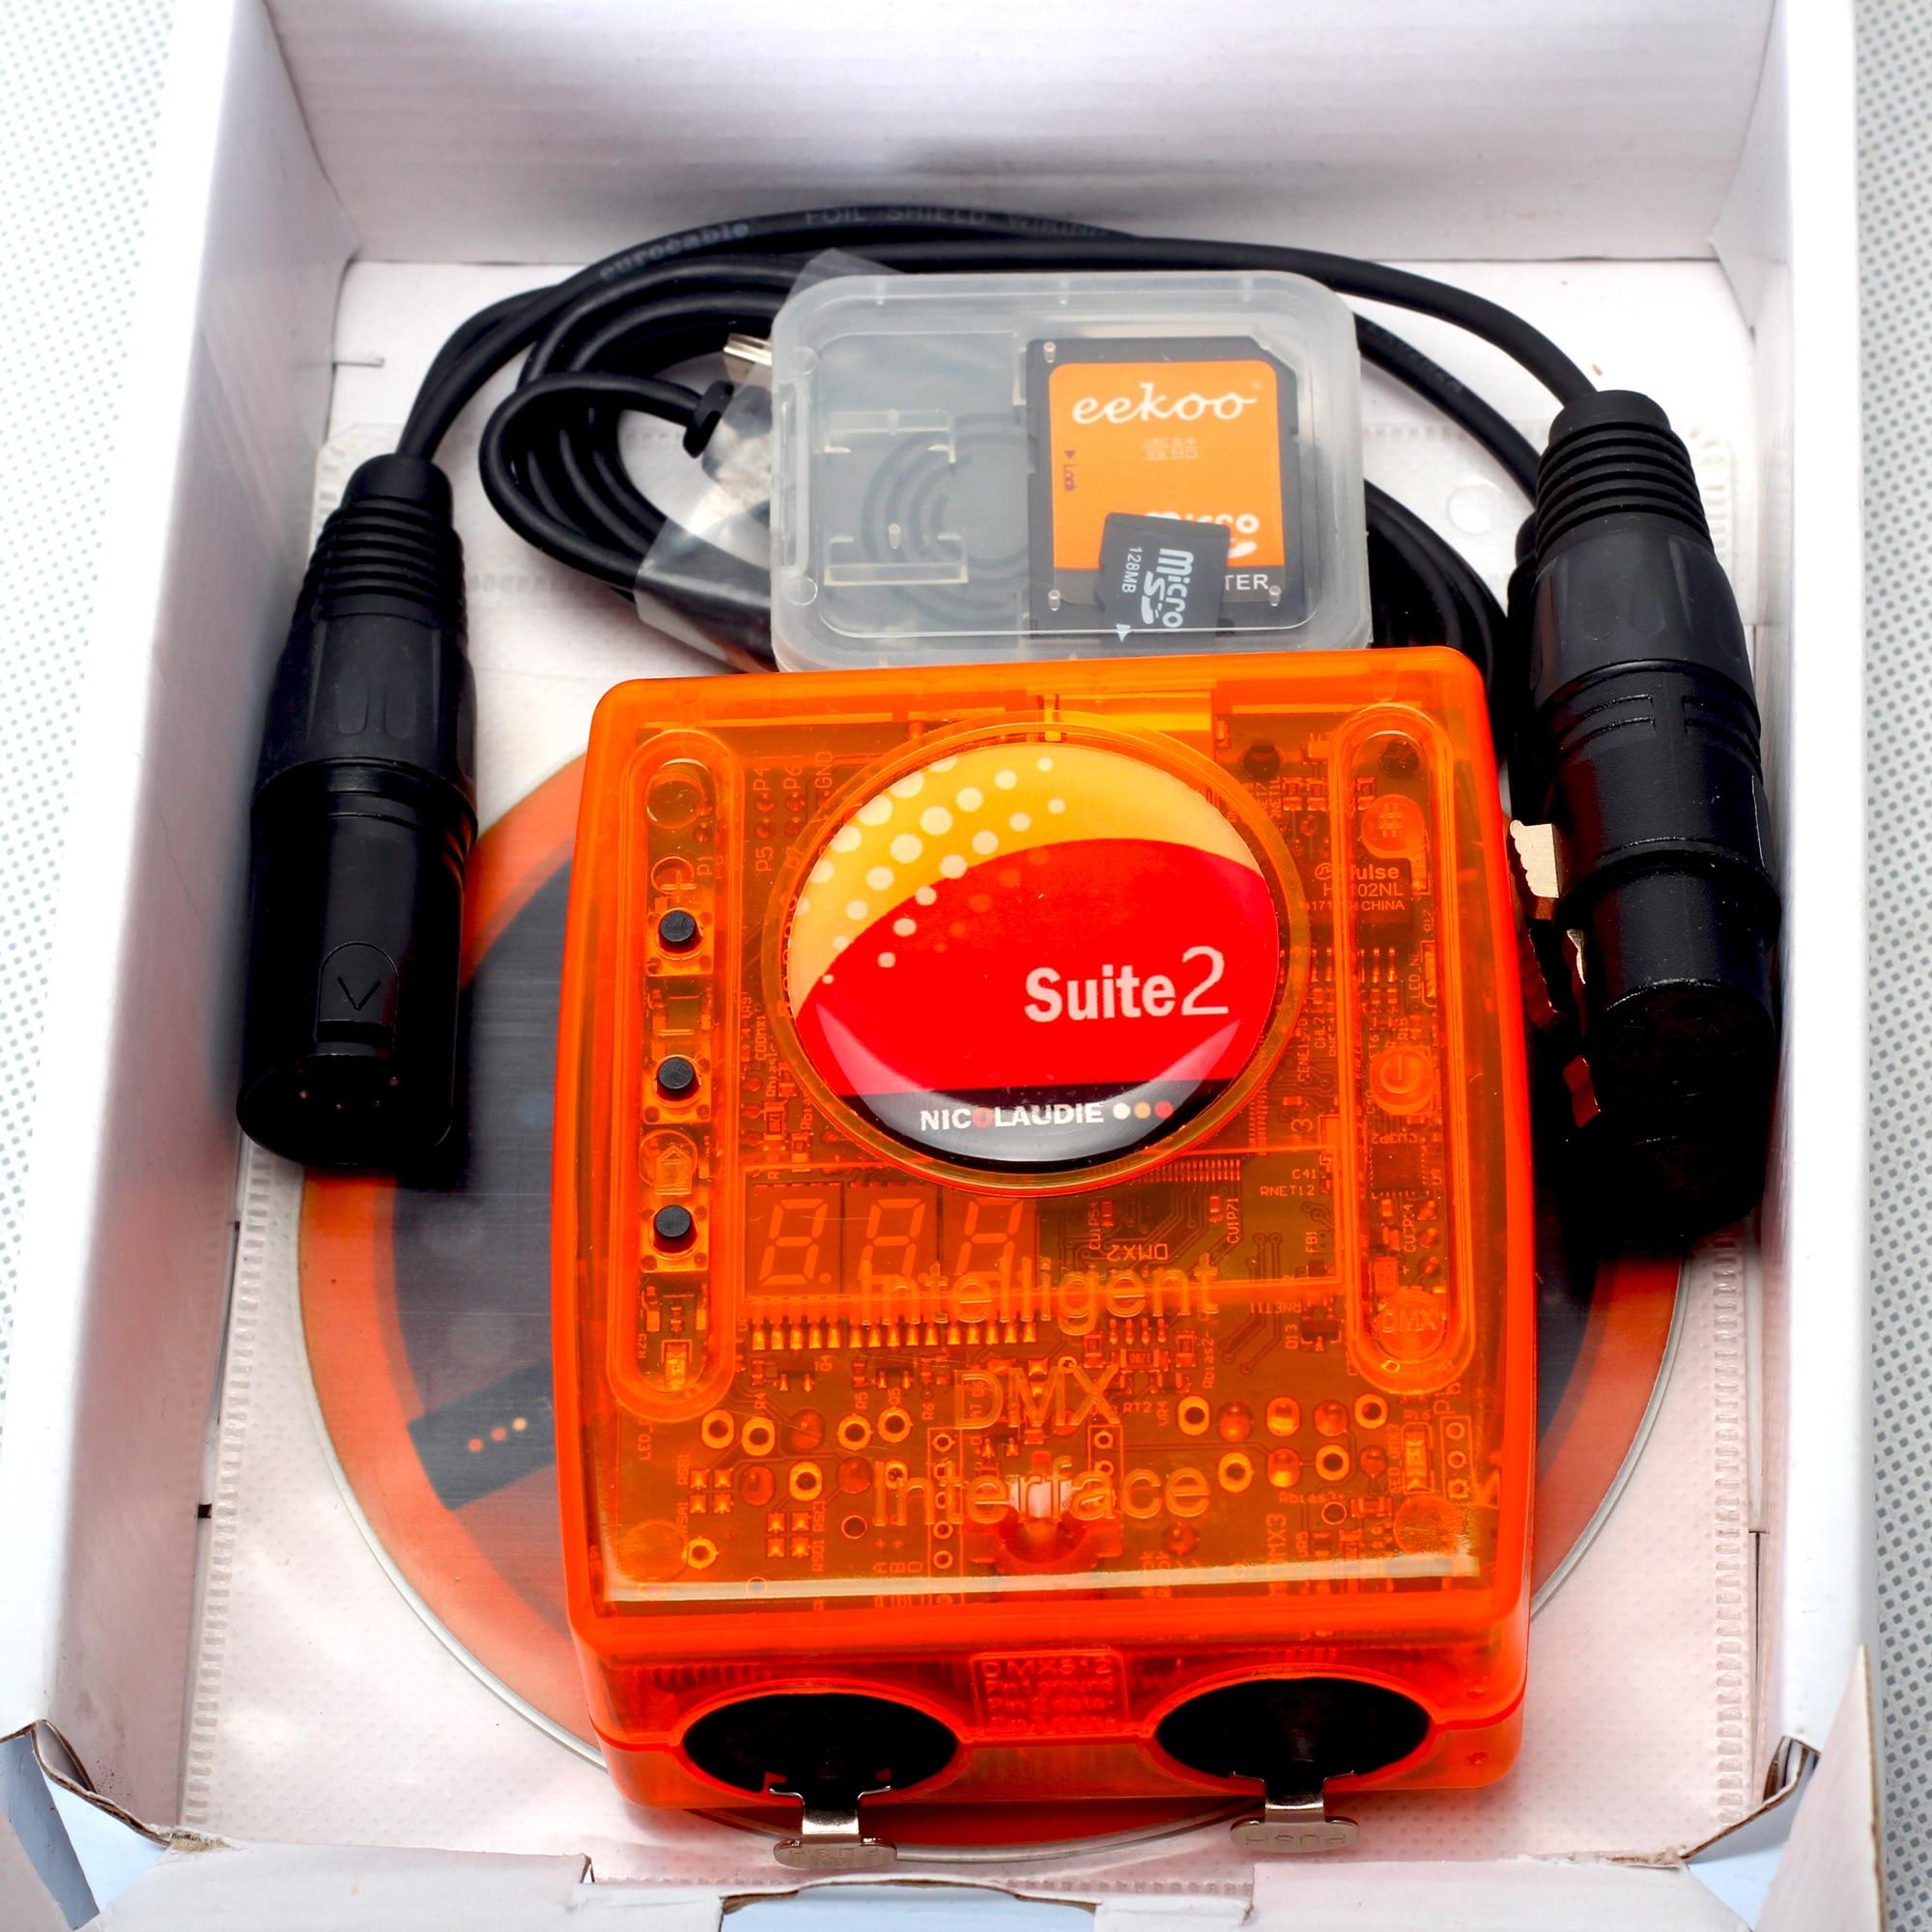 Sunlite 2 FC+ 1024 Professional Stage controlling software Sunlite Suite 2 FC DMX-USB interface DASLIGHT dmx controller console